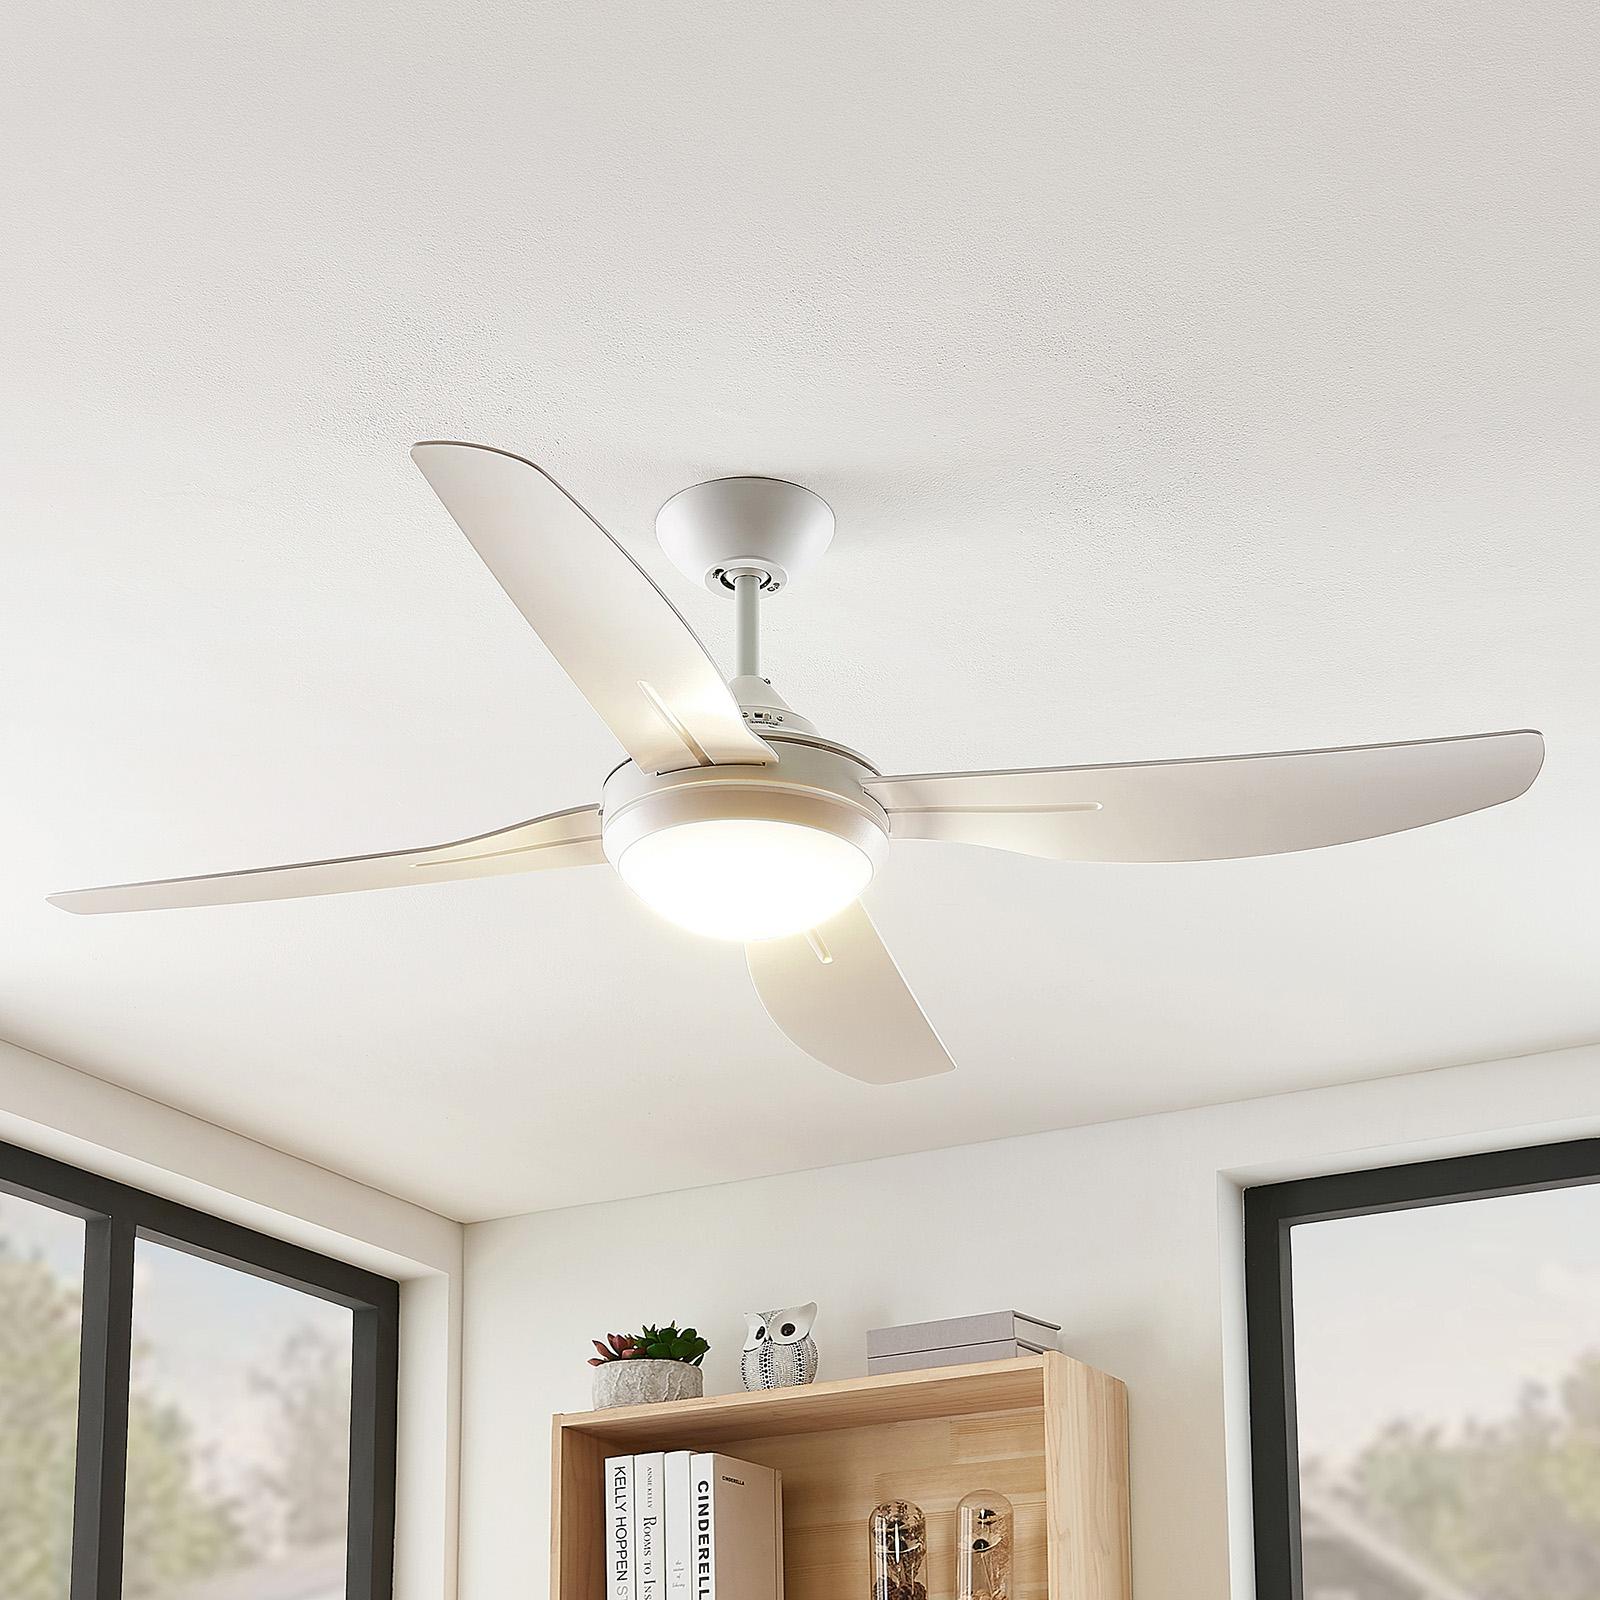 Starluna Inja LED-Ventilator 4 Flügel weiß